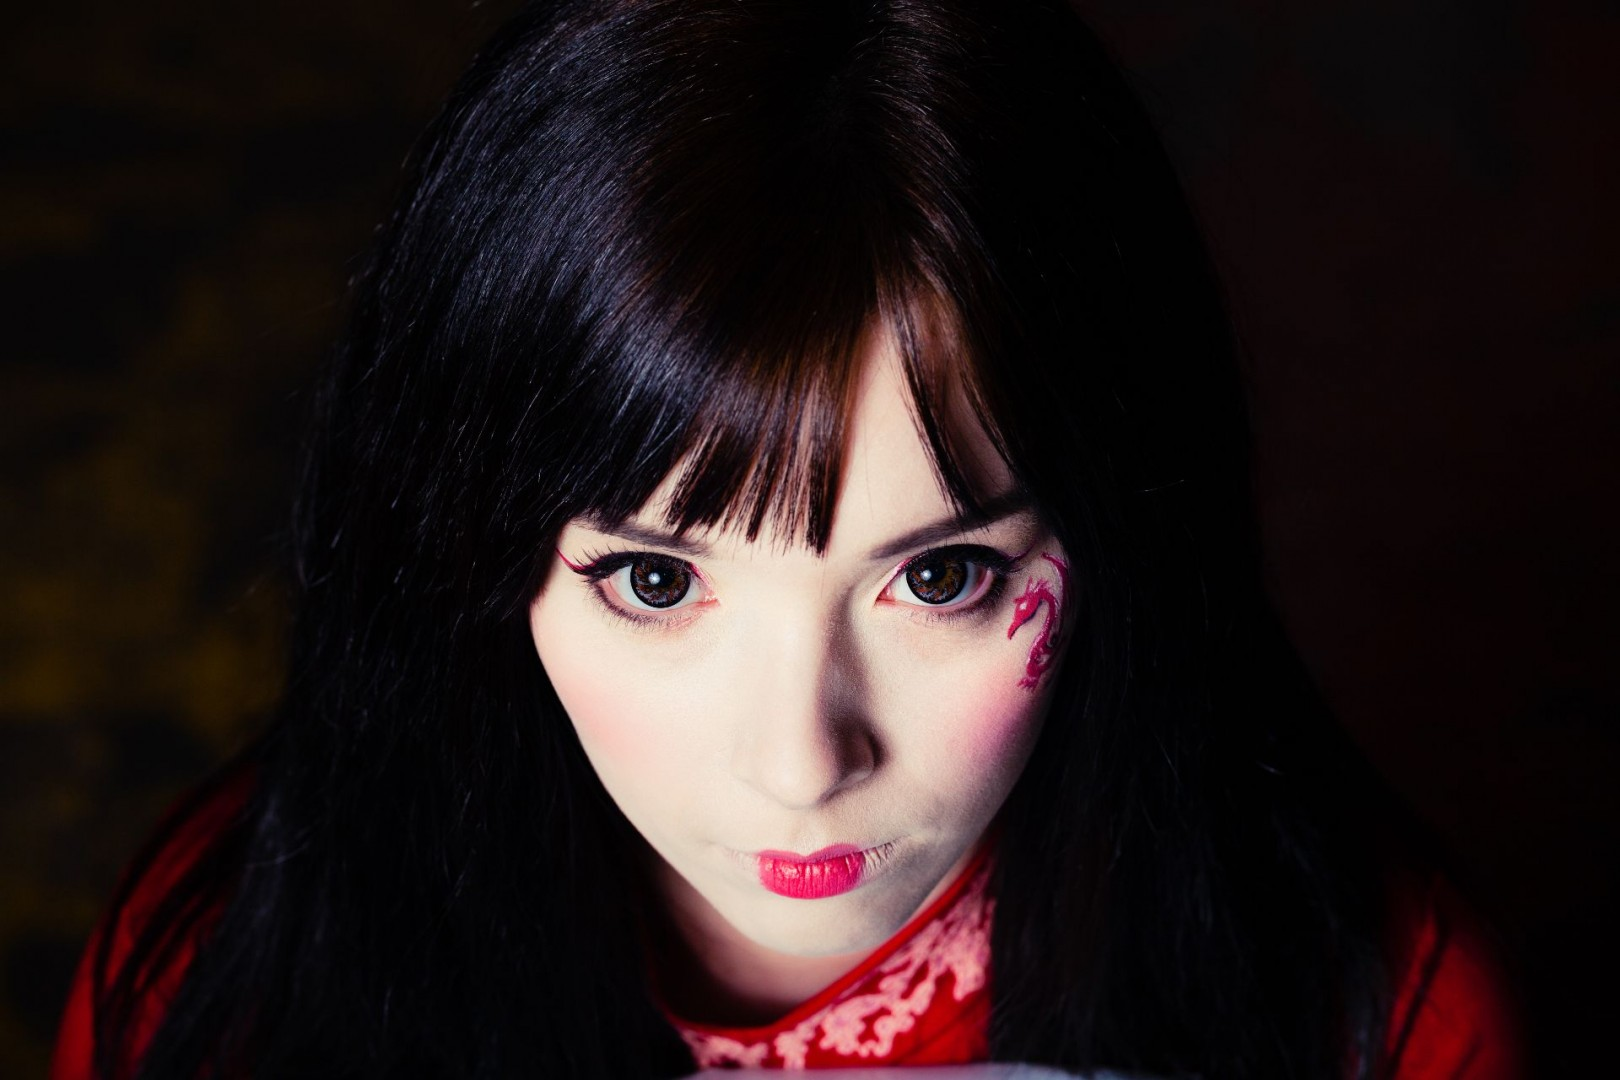 Photo by Gareth Williams <br /> Model: Jamey Nicola